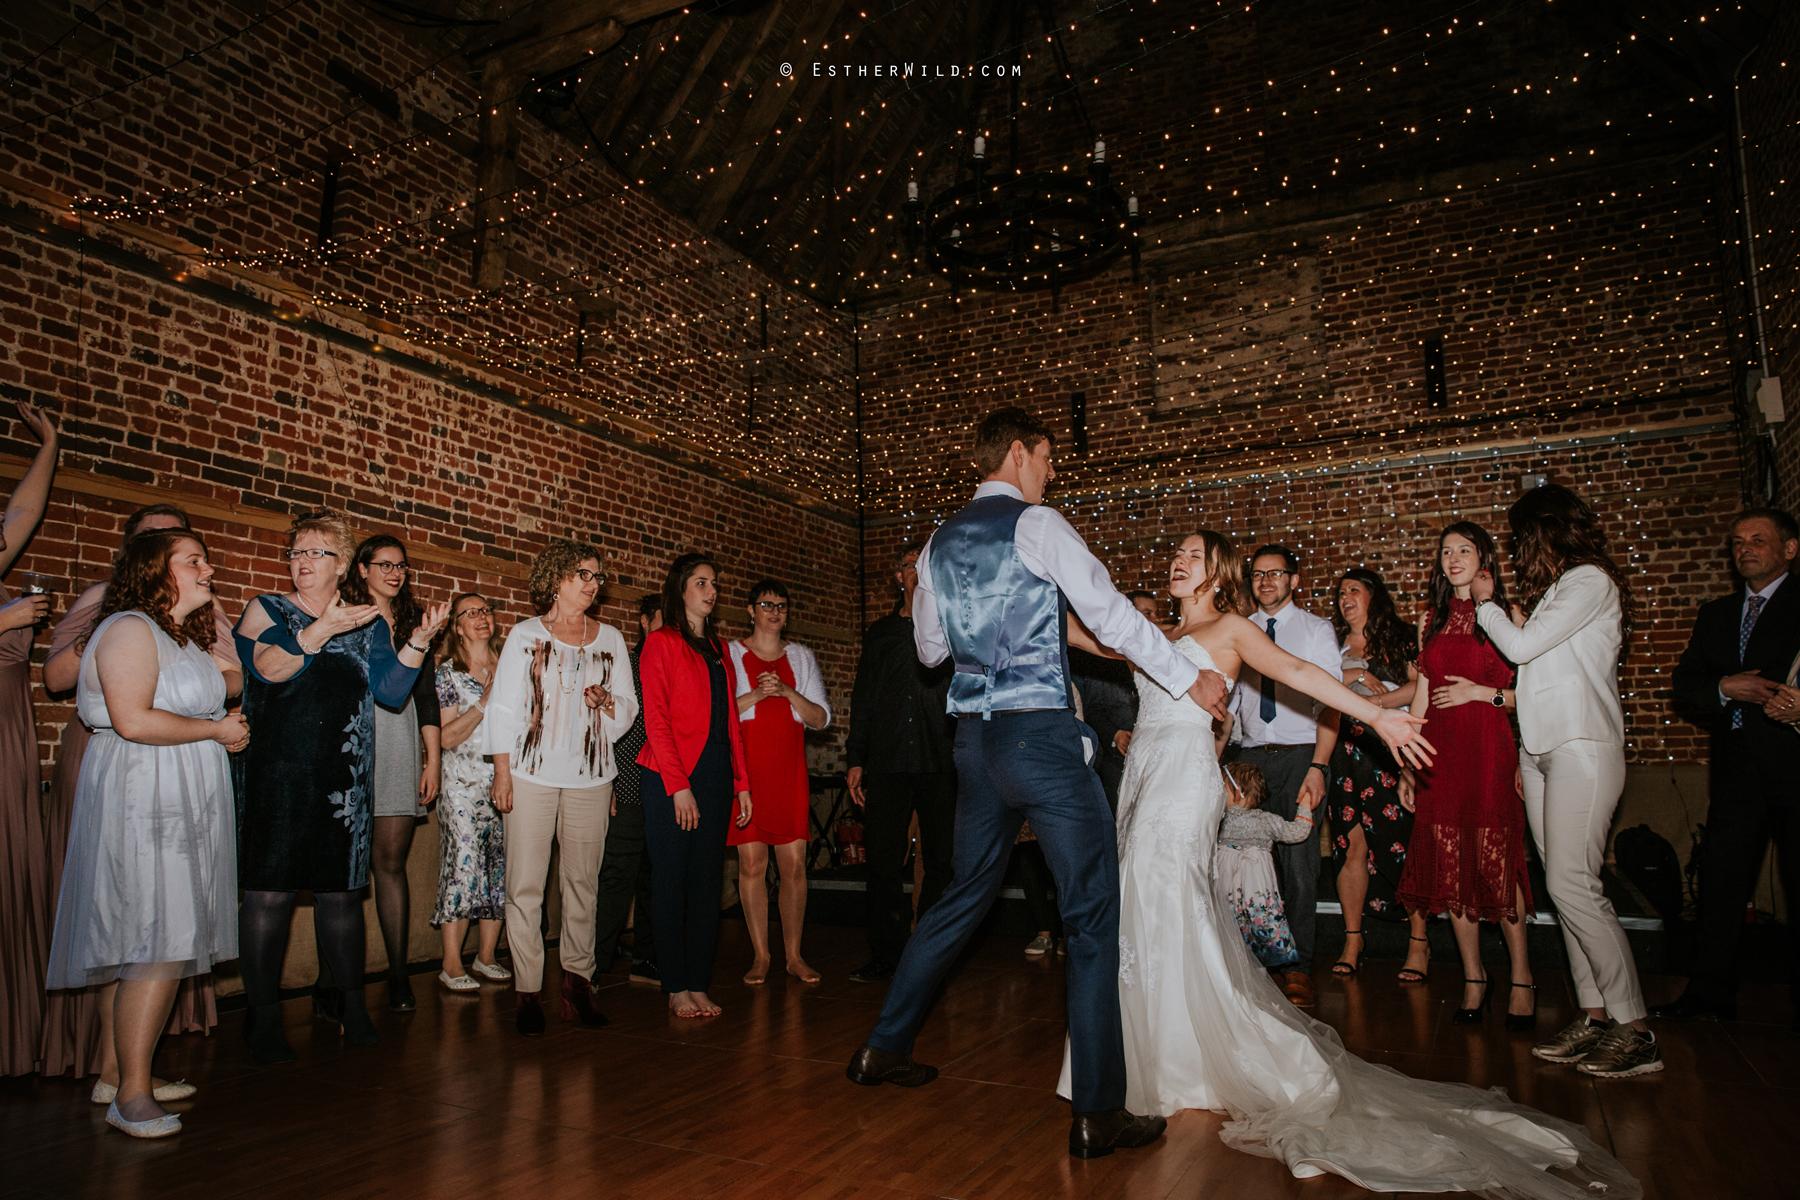 Glebe_Farm_Barn_Rustic_Norfolk_Wedding_Esther_Wild_Photographer_Copyright_IMG_3202.jpg